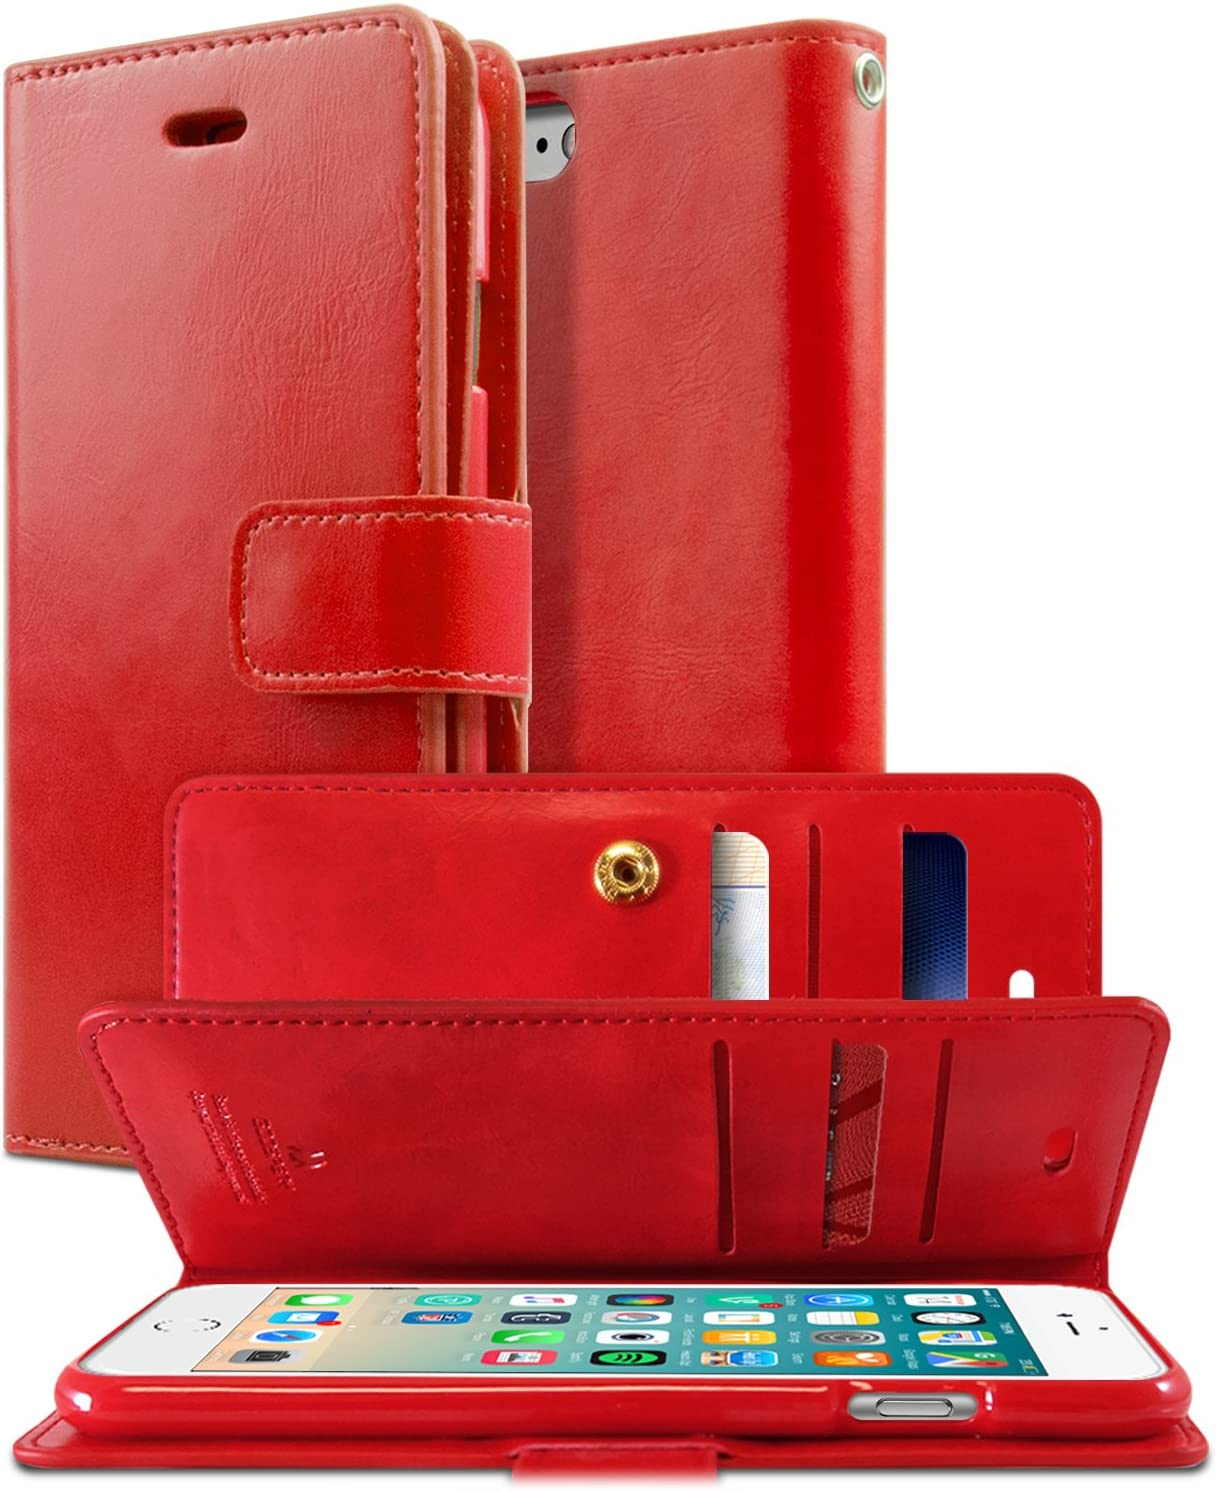 GOOSPERY Mansoor Wallet for Apple iPhone SE 2020 Case, iPhone 8 Case, iPhone 7 Case, Double Sided Card Holder Flip Cover (Red) IP7-MAN-RED